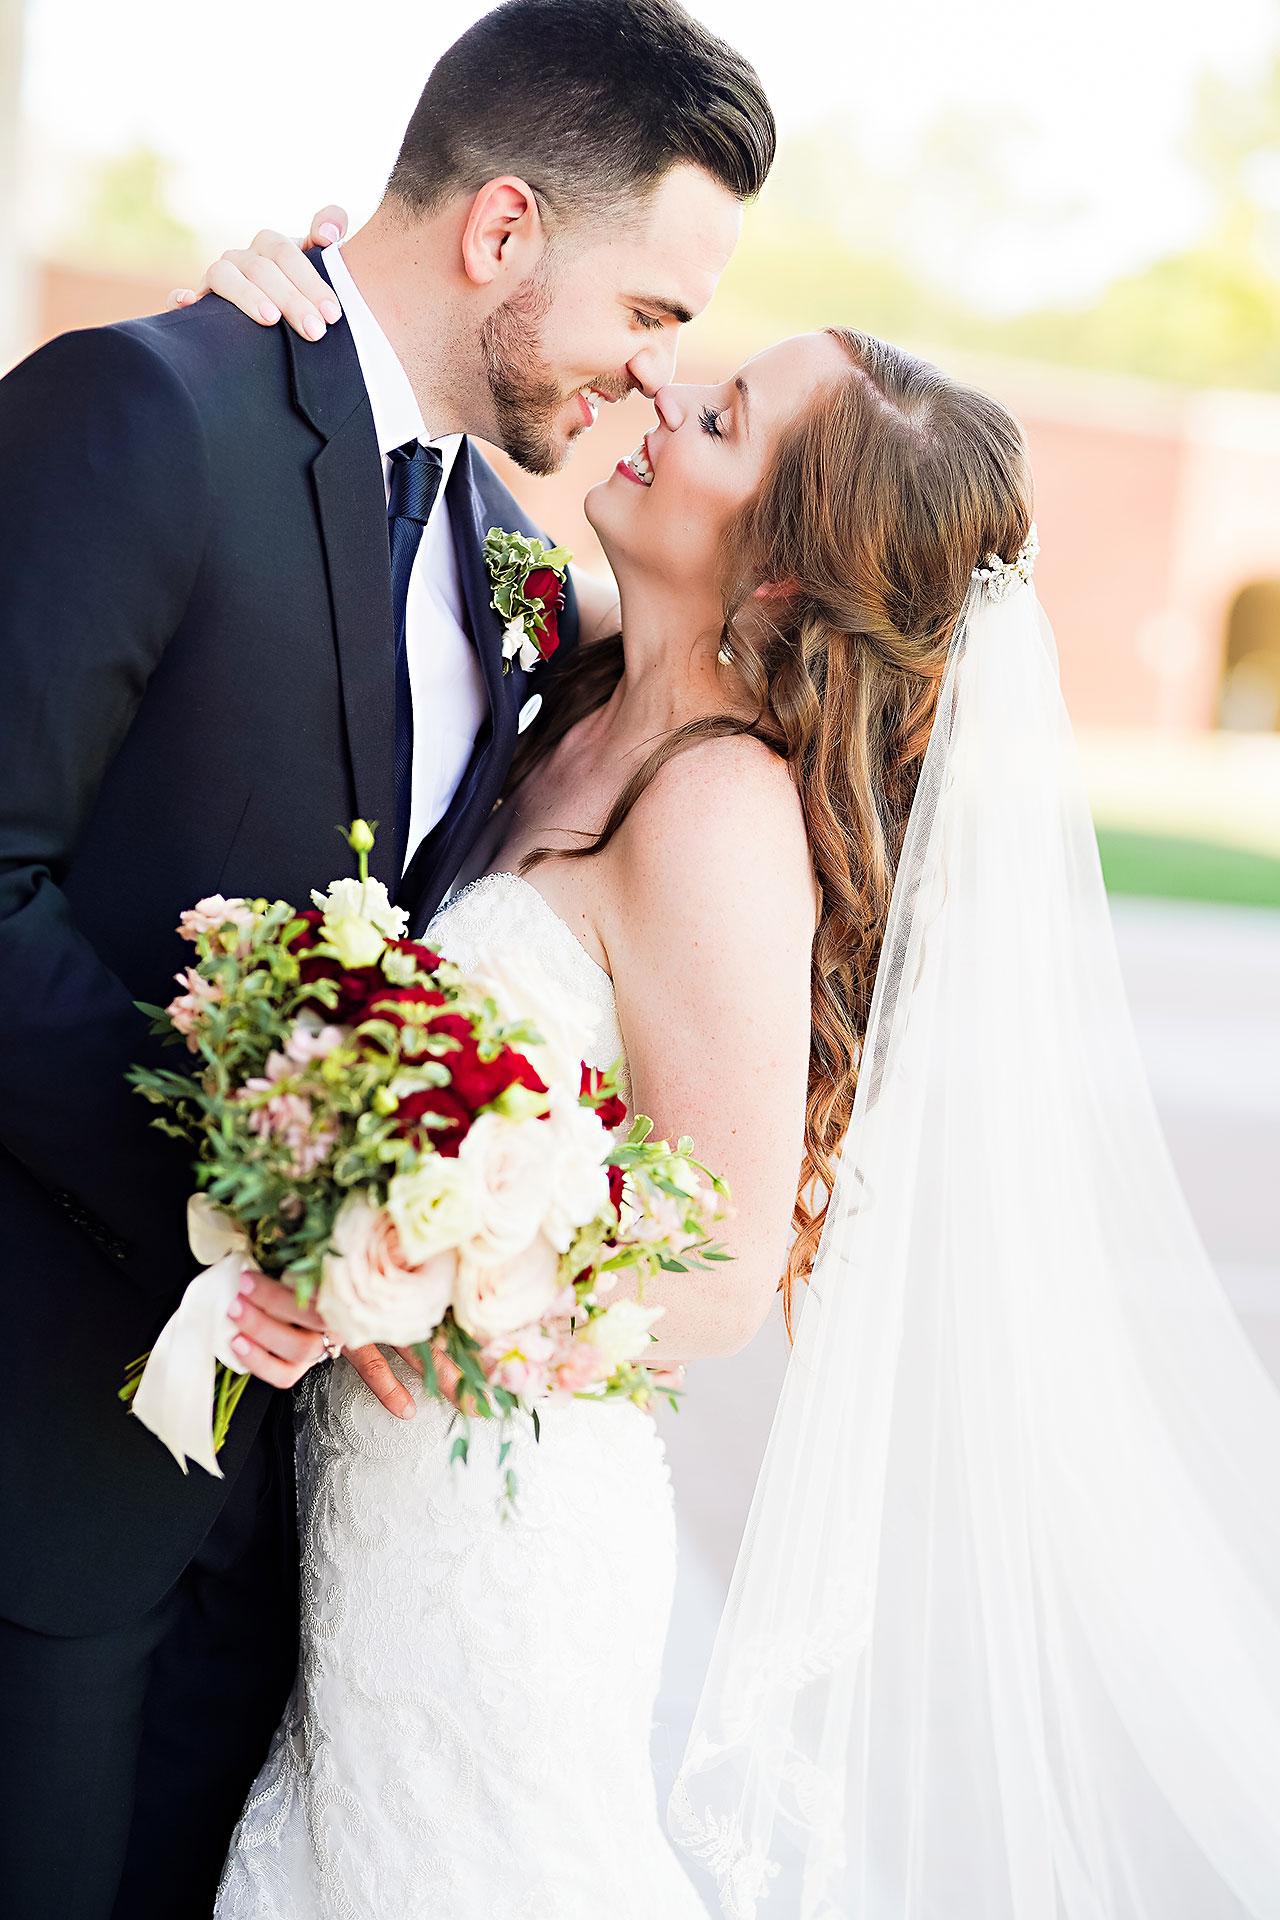 Callie Josh Ritz Charles Garden Pavilion Carmel Indiana Wedding 075